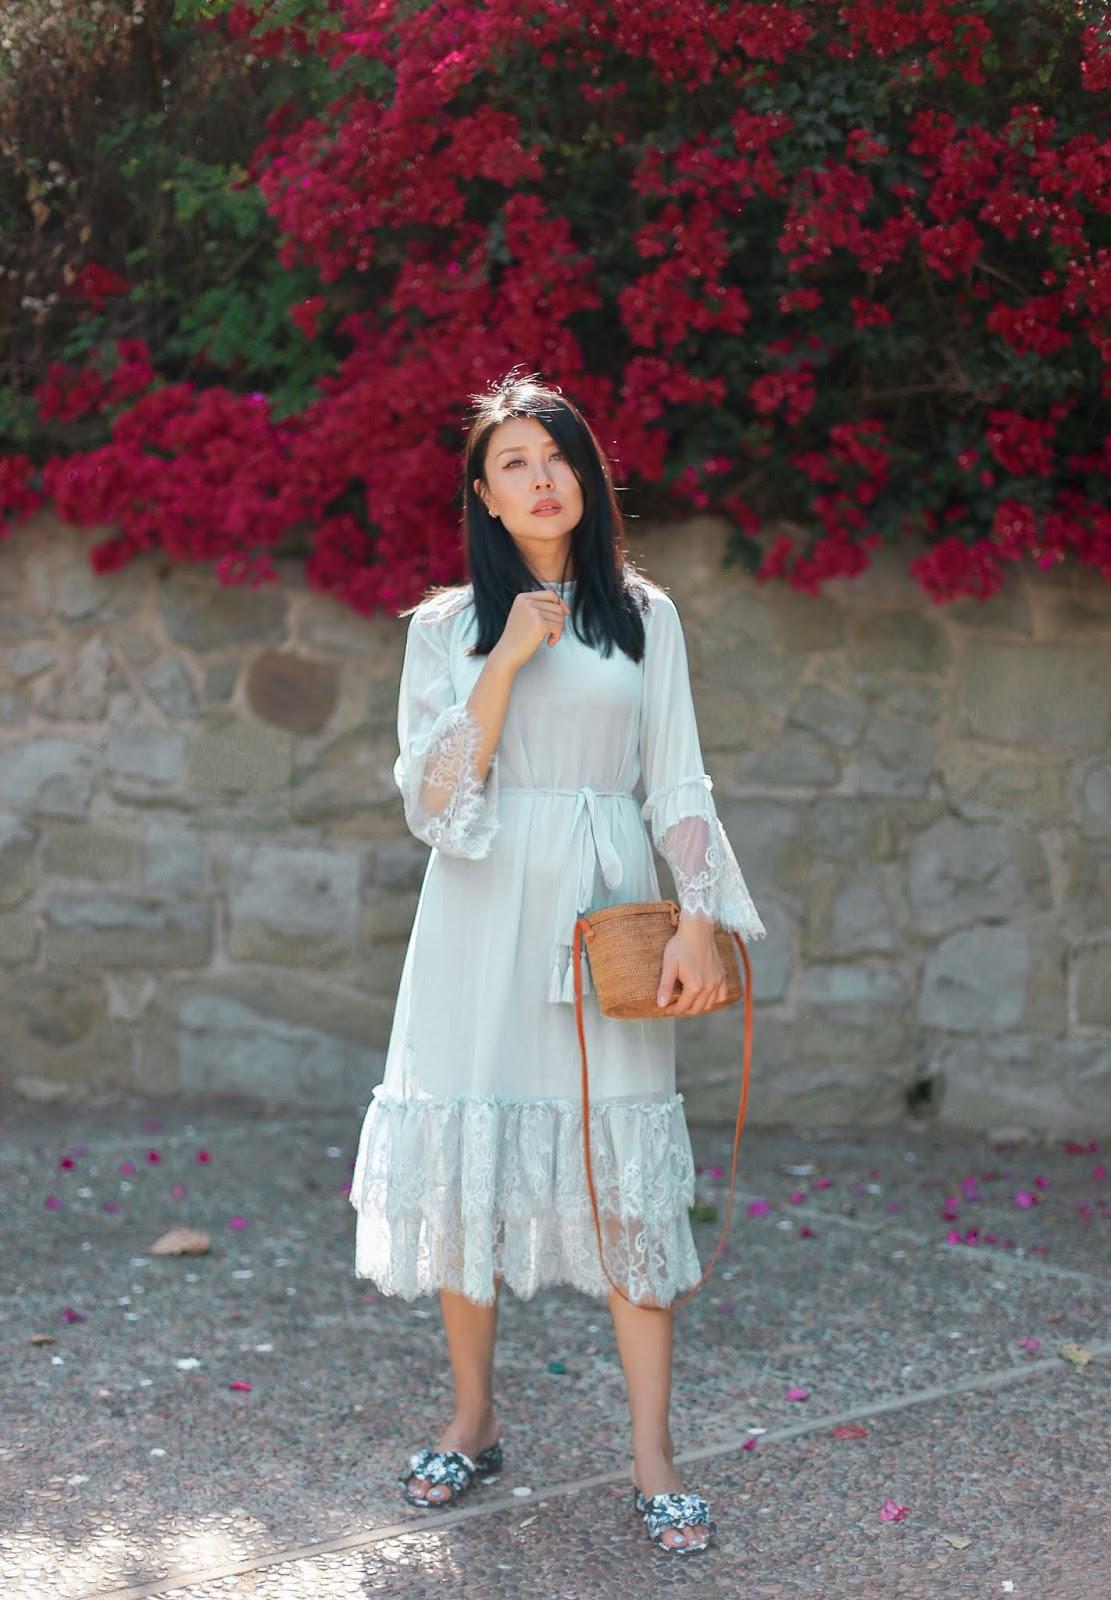 summer pastel blue dress outfit inspiration